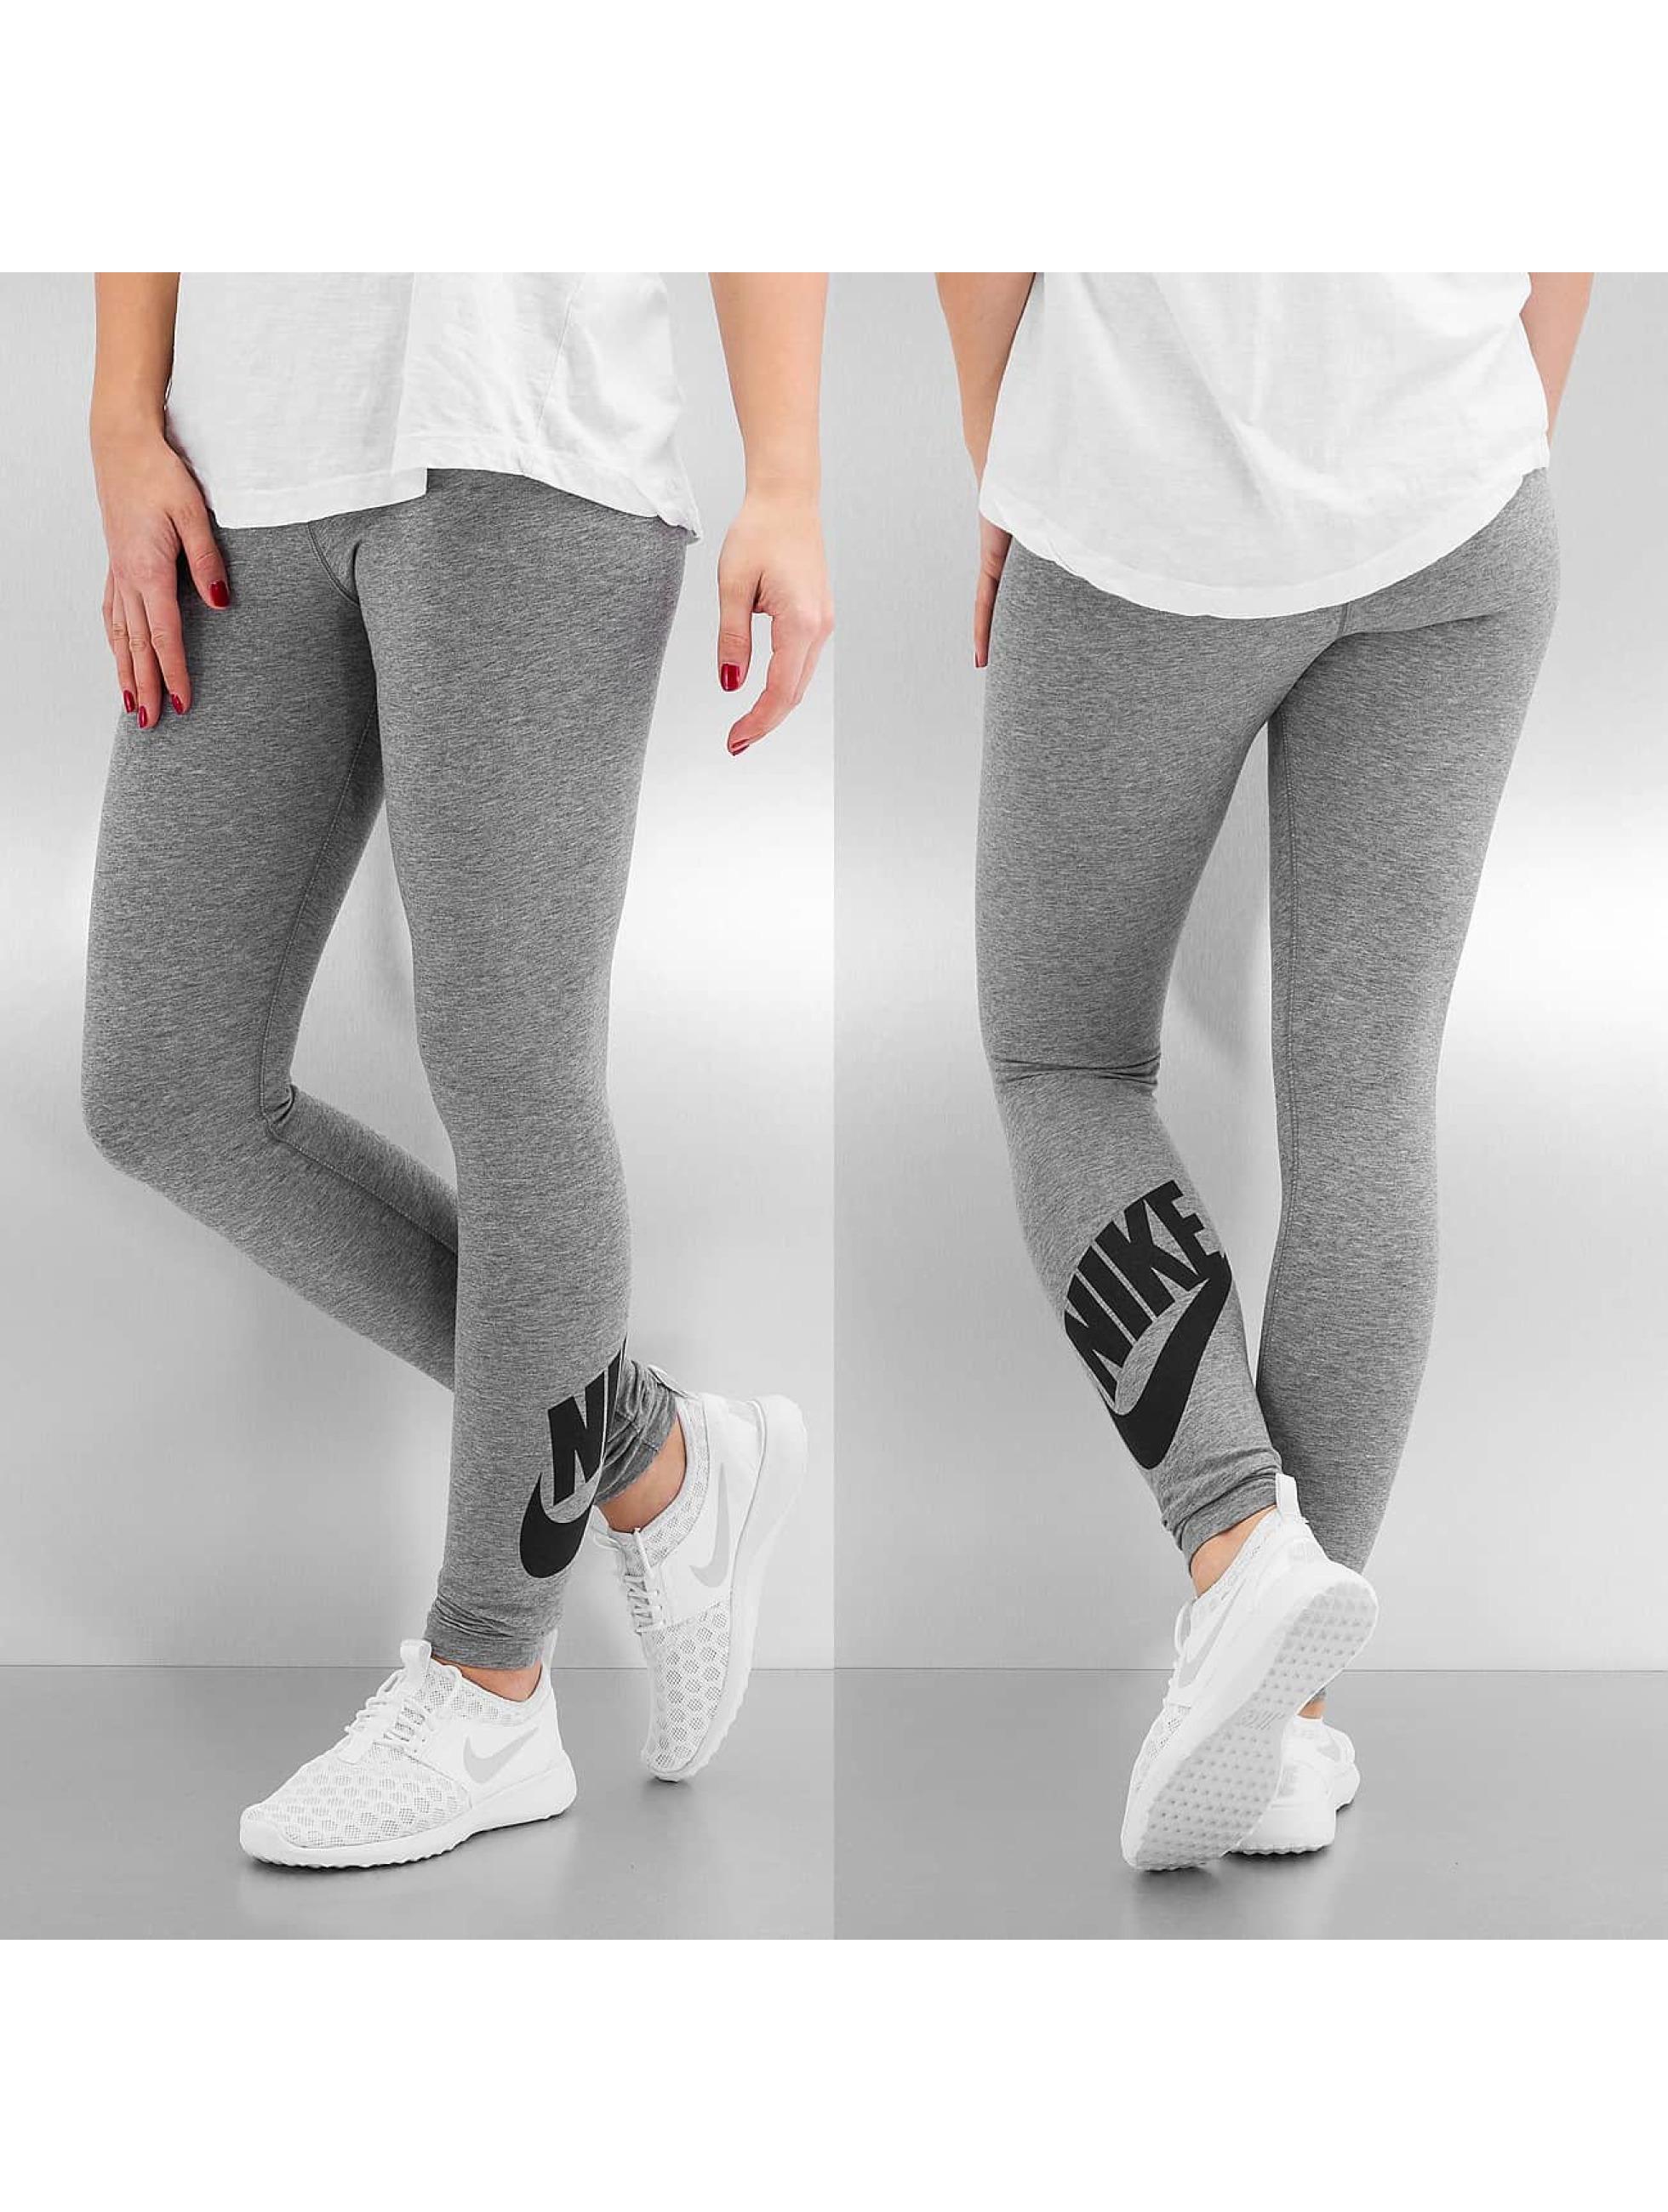 legging adidas femme gris legging en coton gris pour femme adidas originals v tements acdv collant s. Black Bedroom Furniture Sets. Home Design Ideas